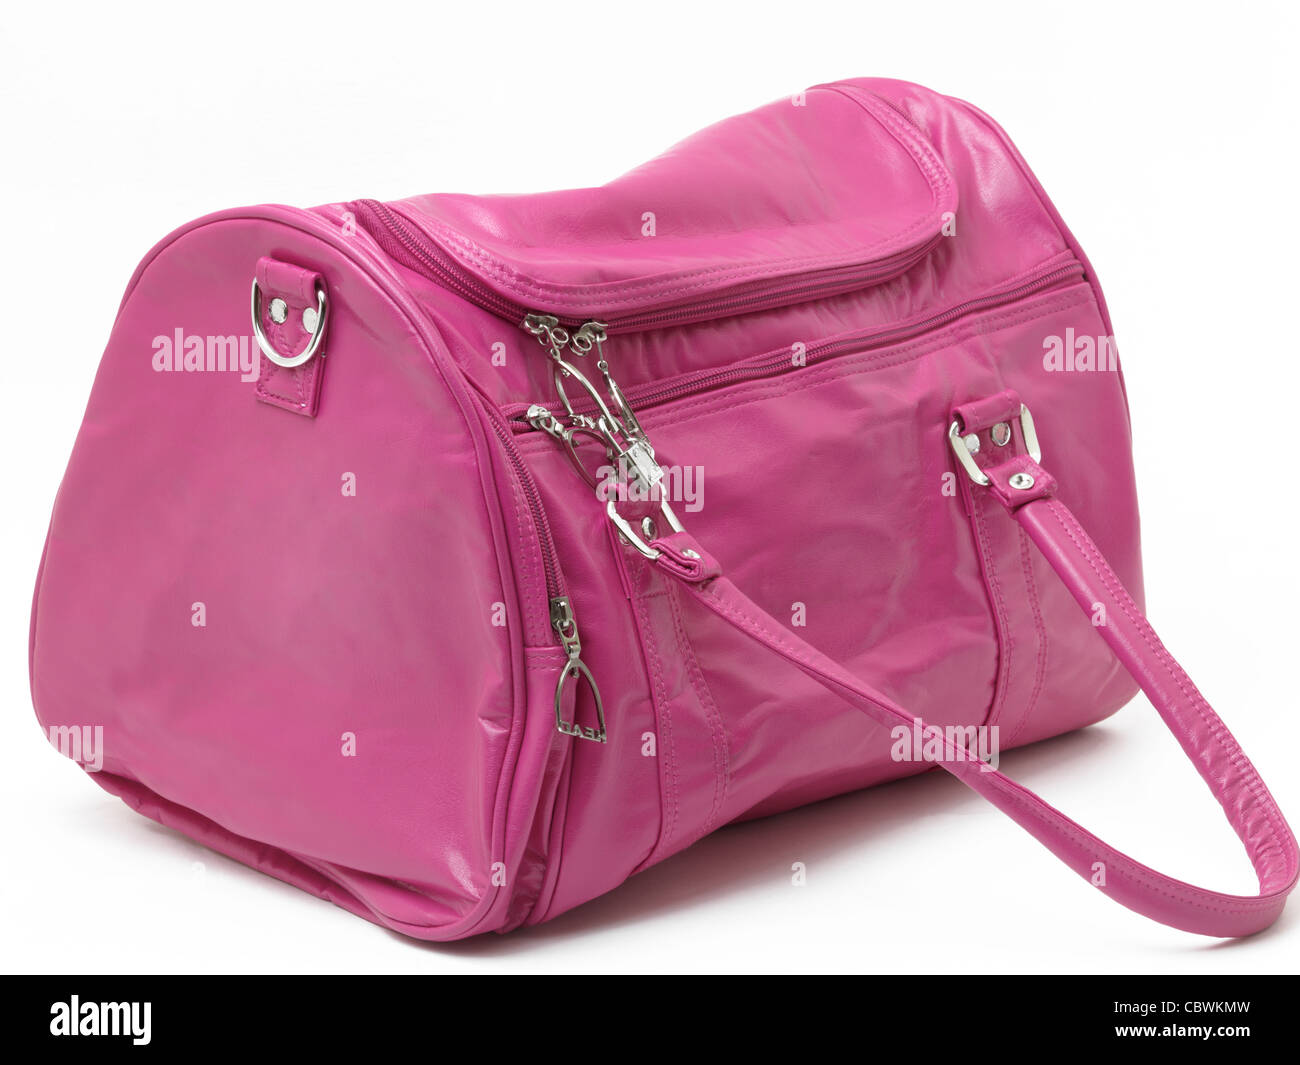 cdba62ef61 Pink Sports Bag Stock Photo  41746233 - Alamy